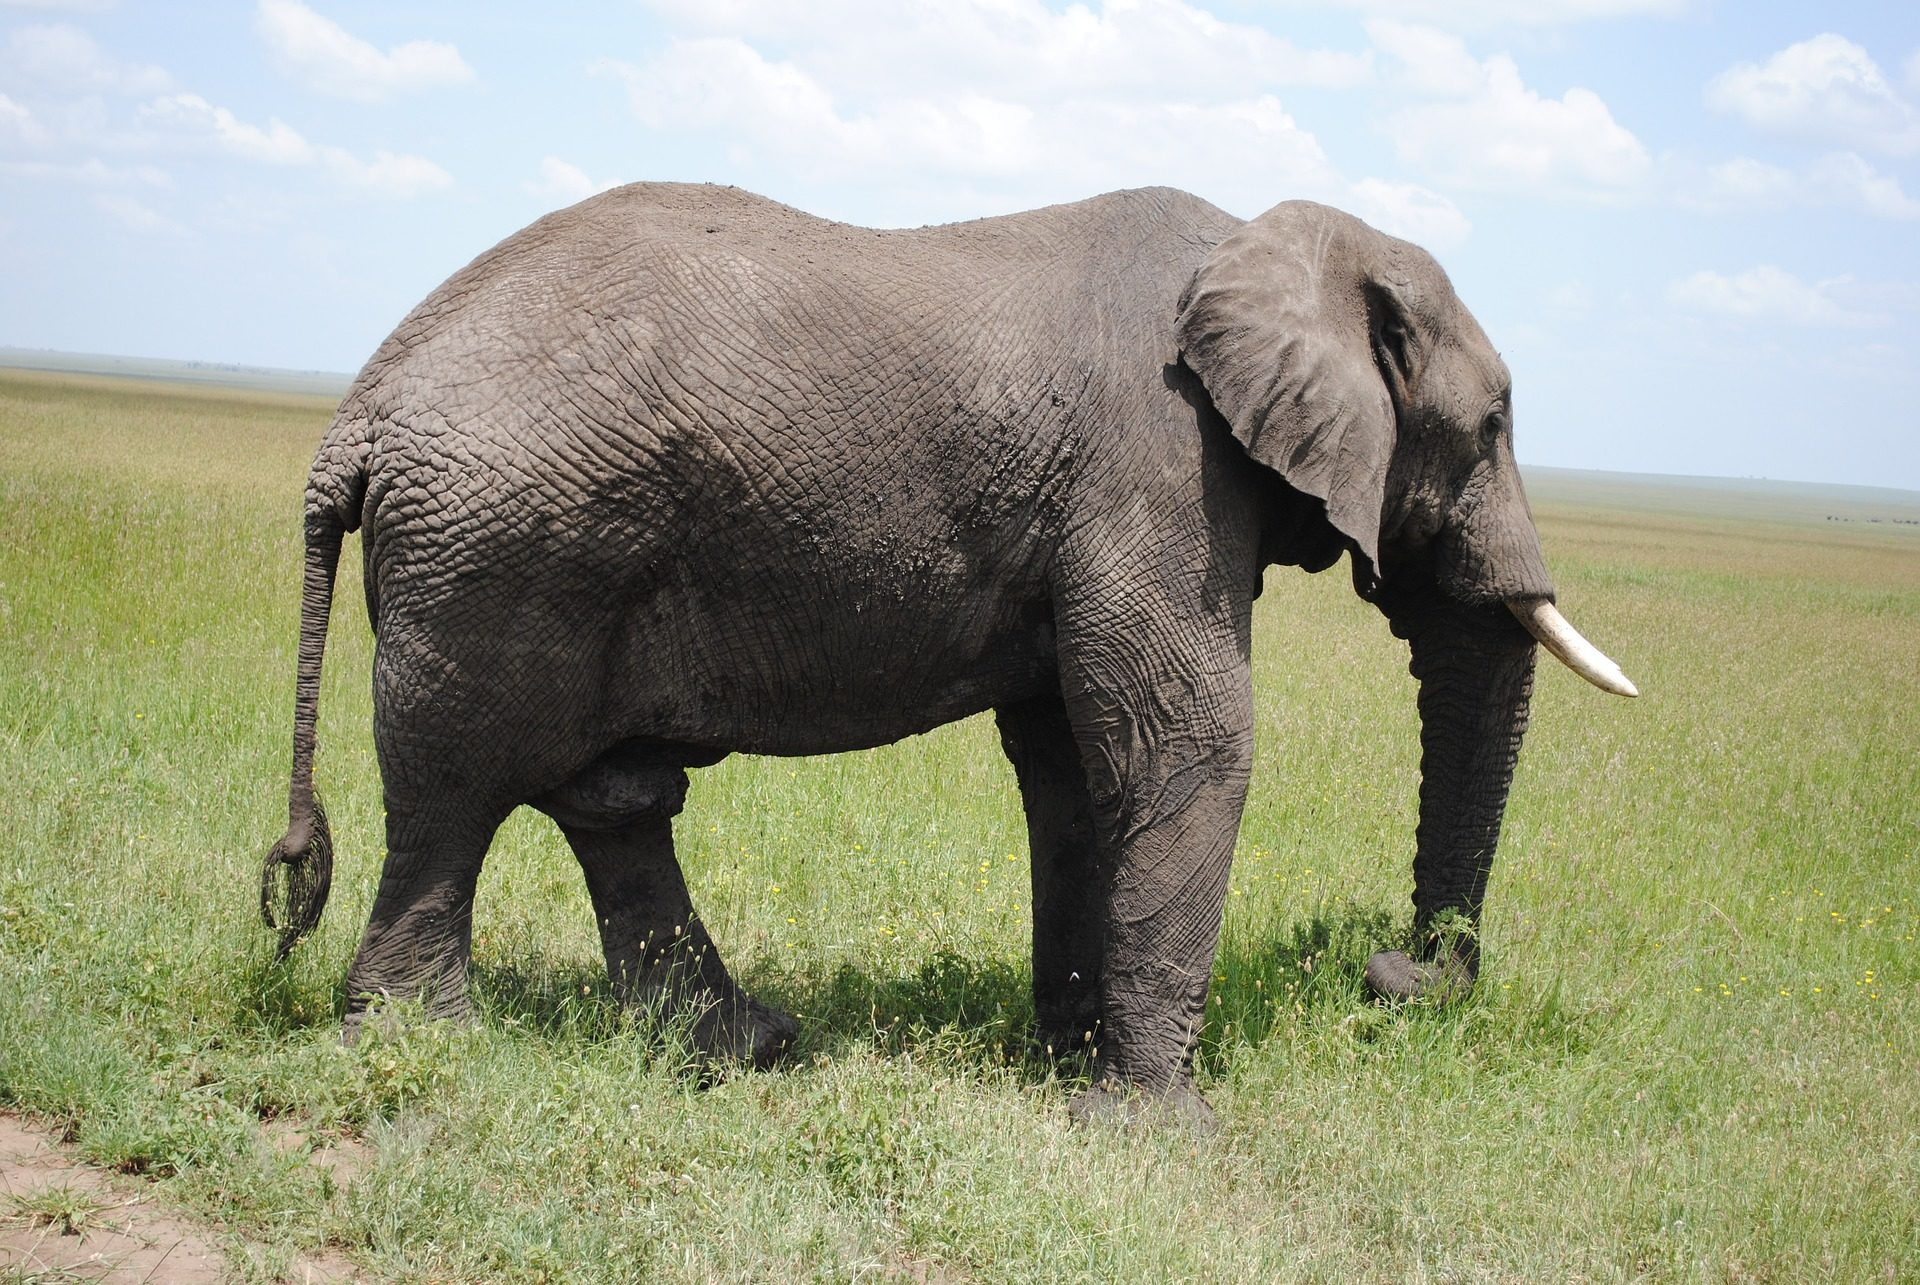 éléphant, Crocs, liberté, Serengeti, Tanzanie - Fonds d'écran HD - Professor-falken.com